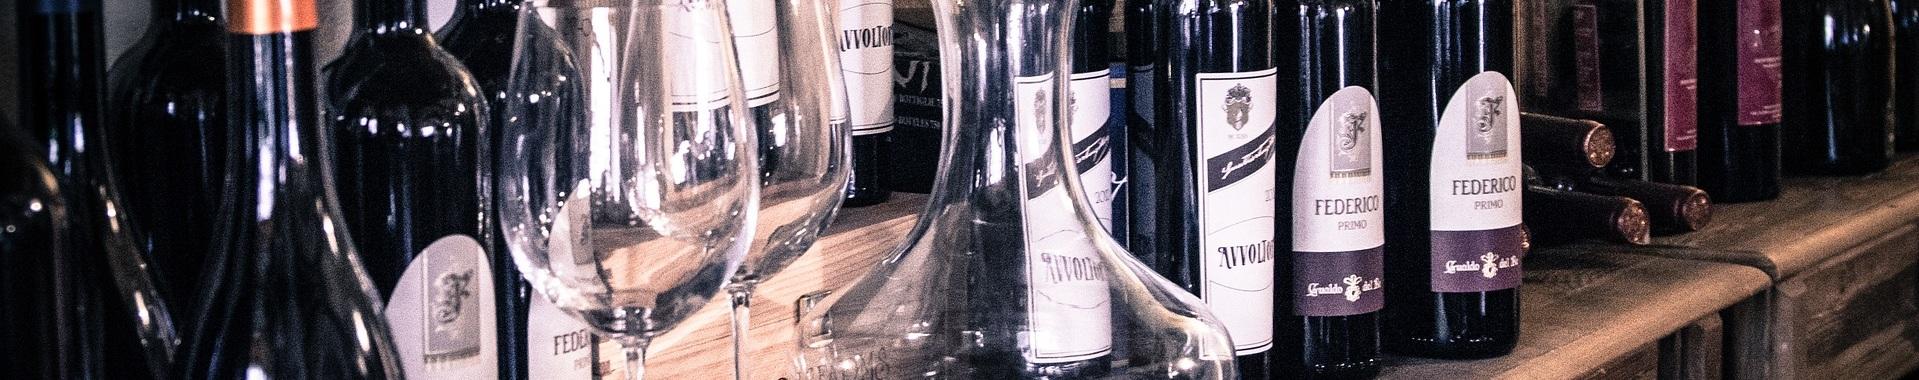 wine-2732982_1920.jpg